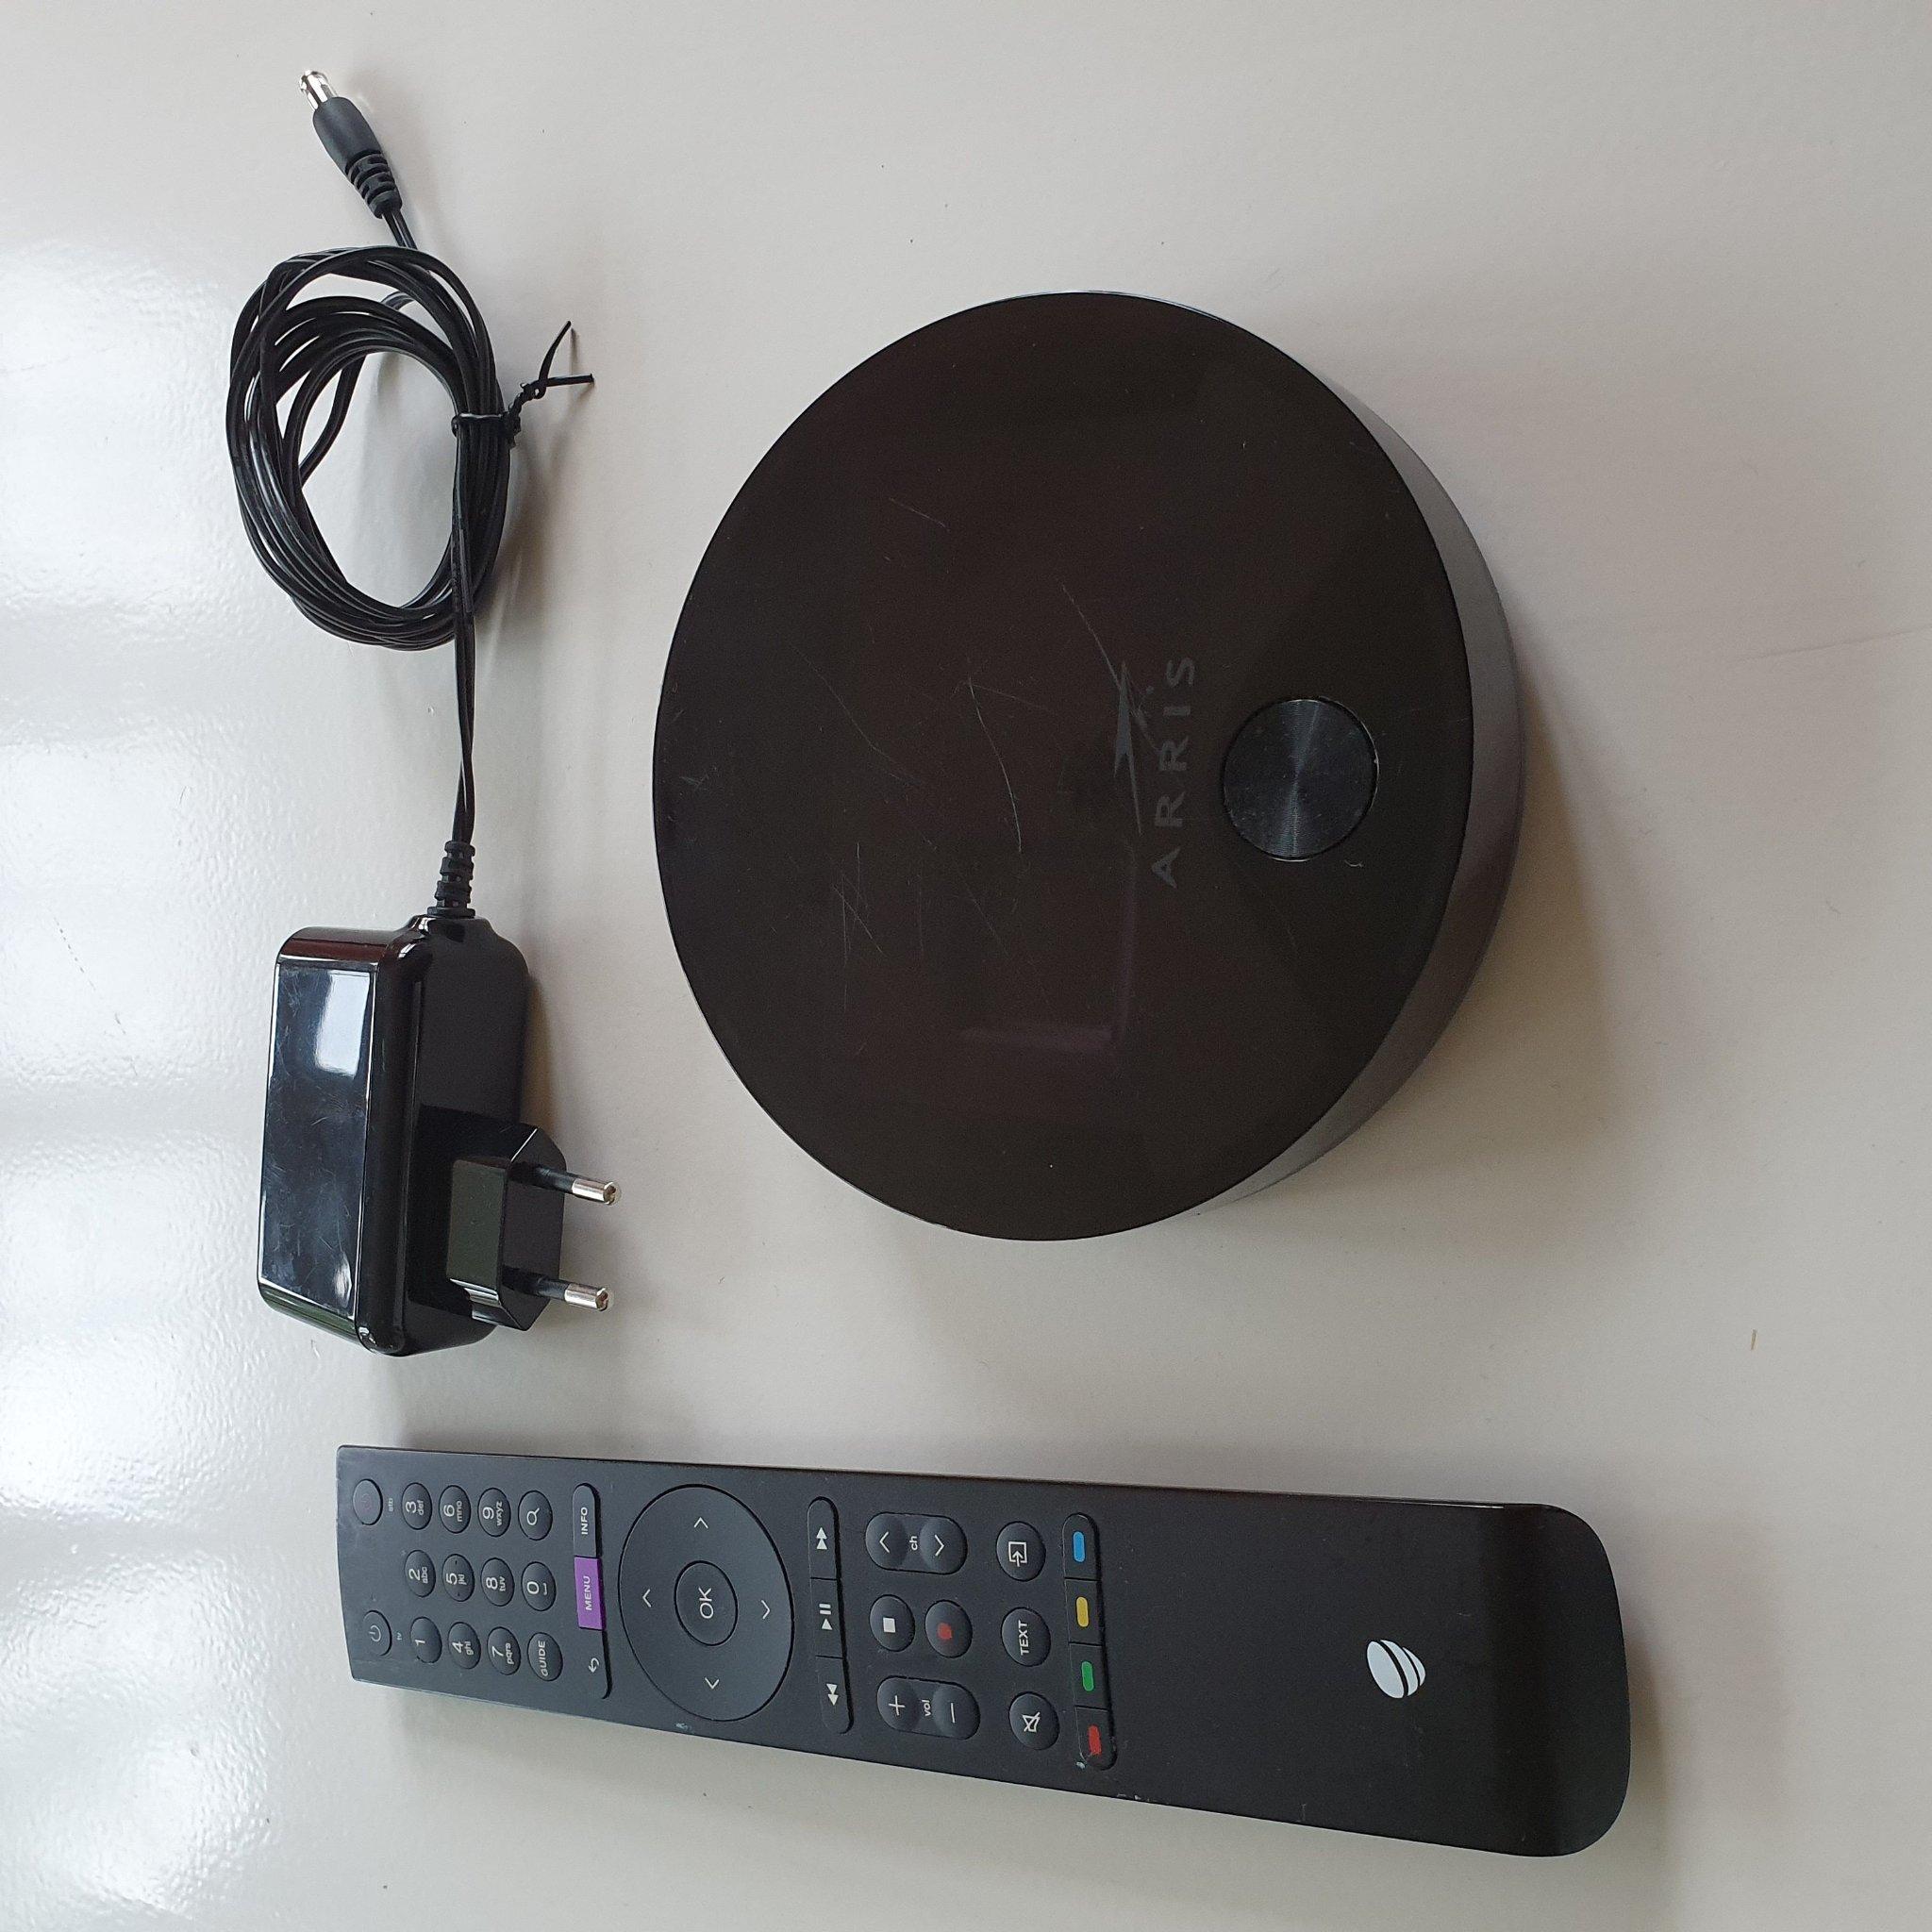 Arris Tv Box